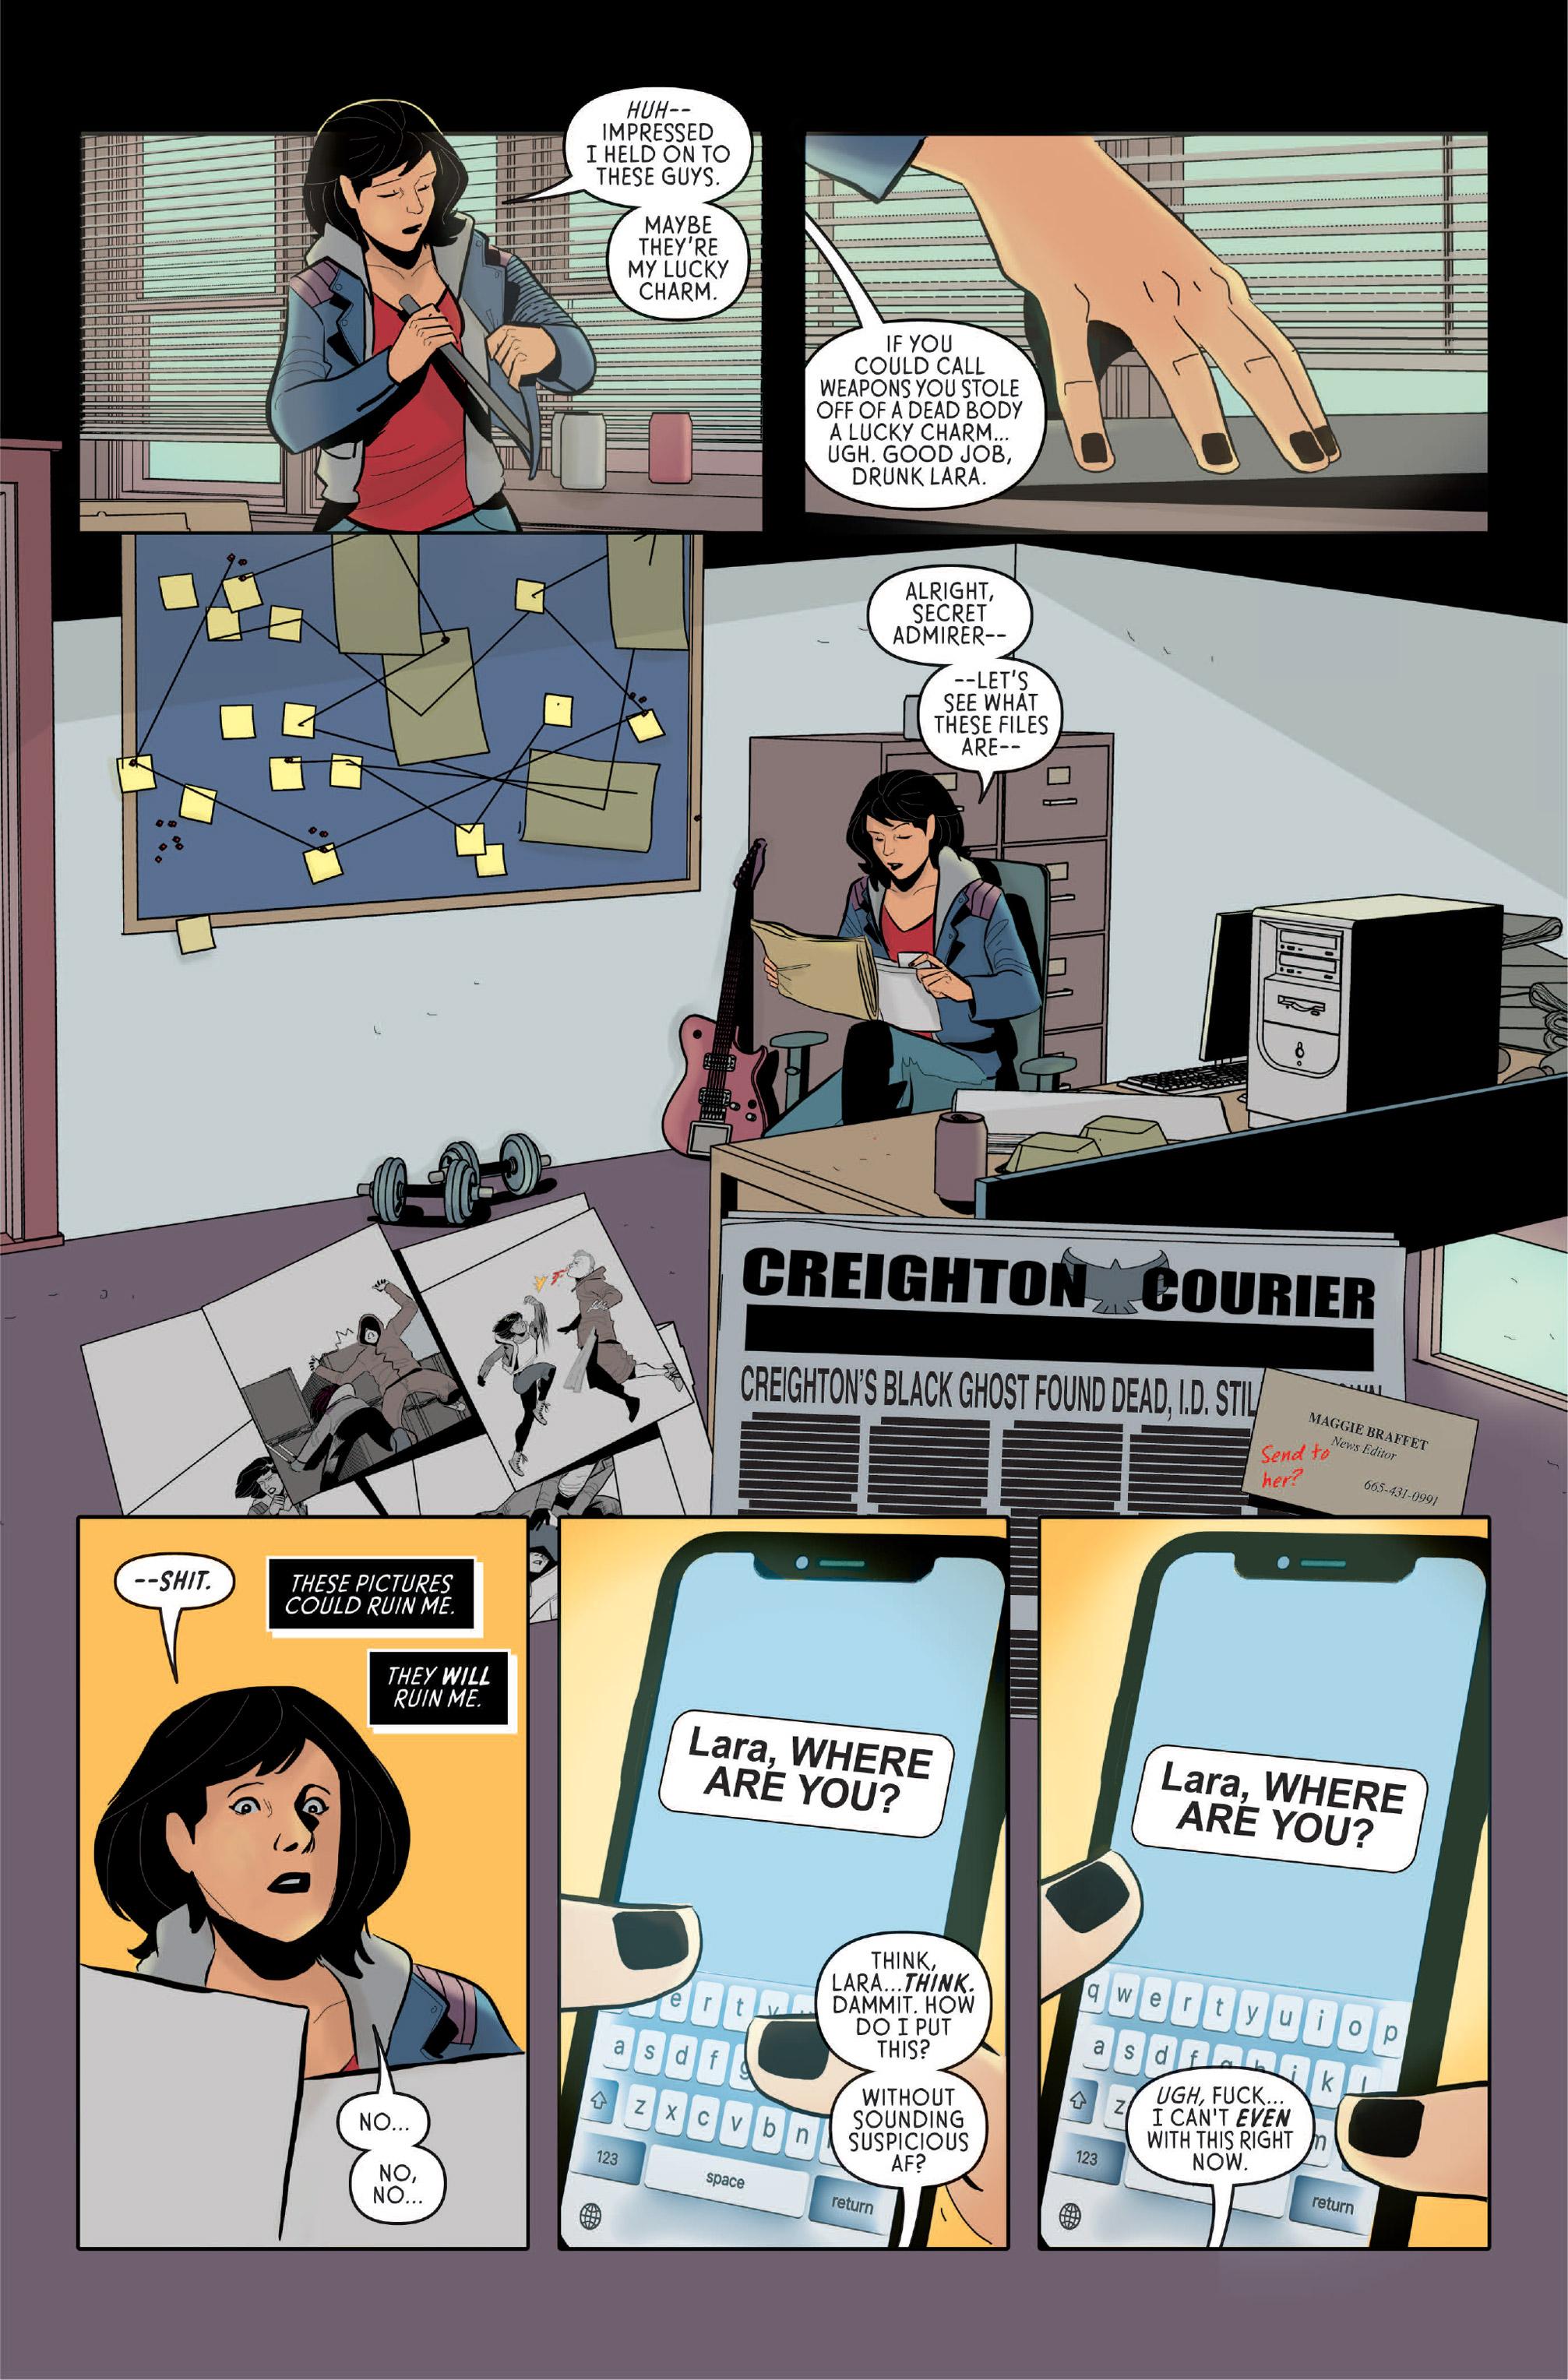 Page 13, New Wave Comics, 2019.